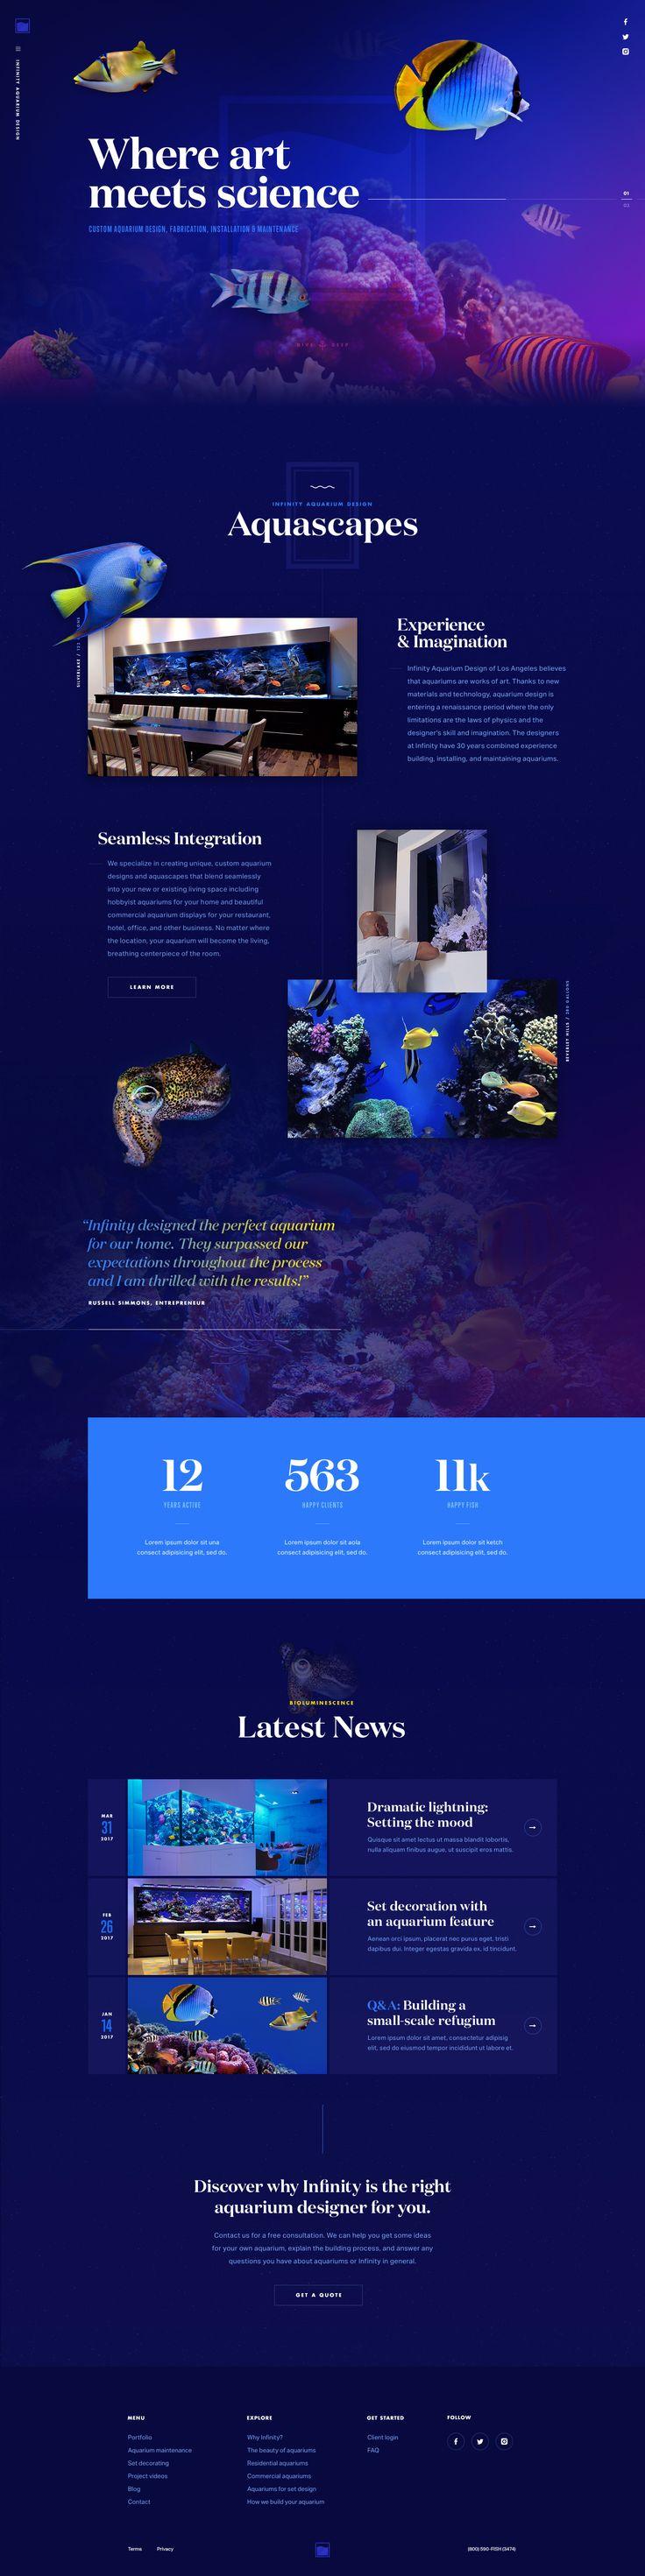 Aquarium Design & Installation – Nautical Ui design concept and visual identity by Mason Yarnell.